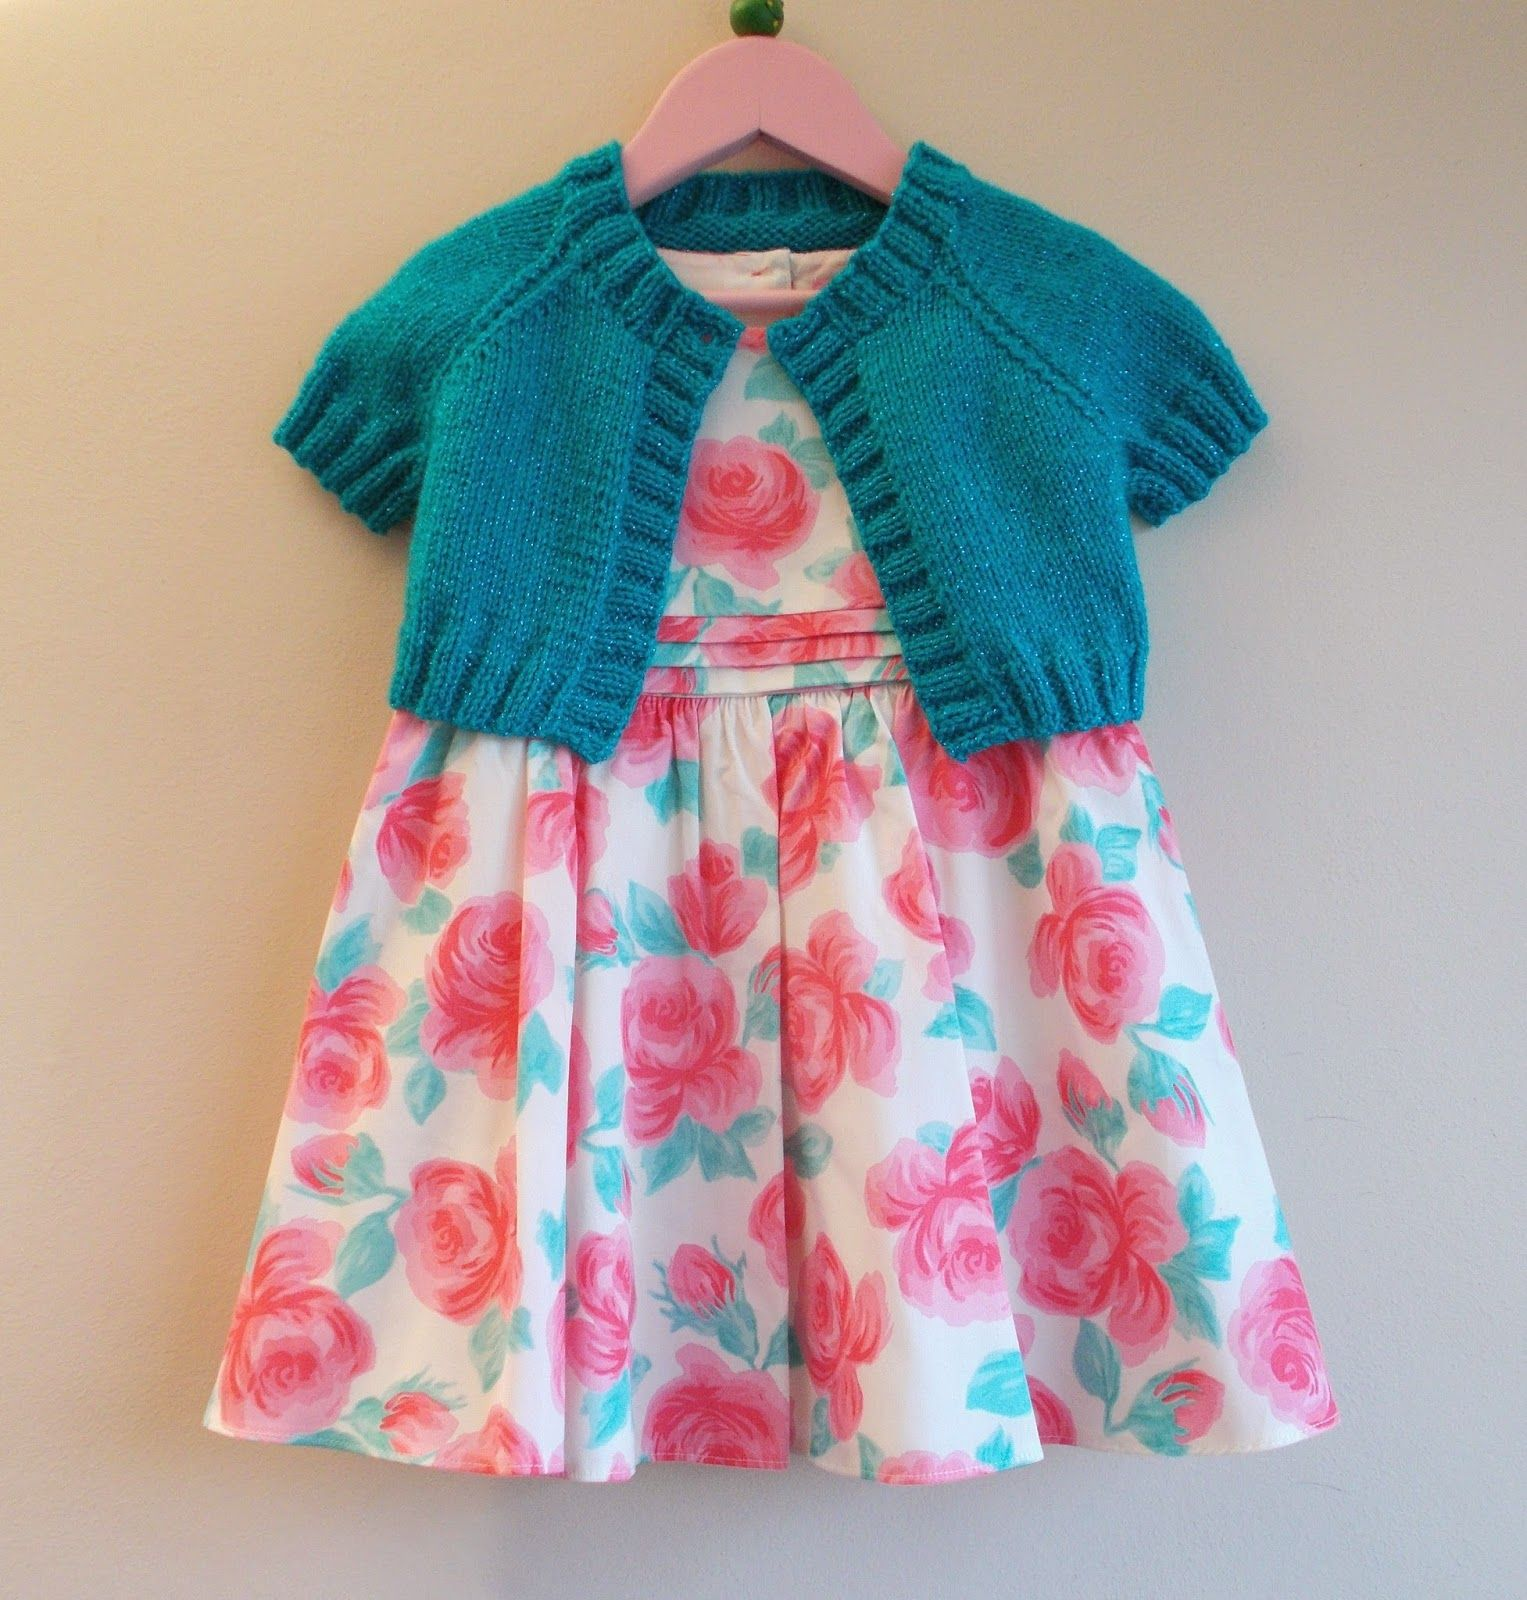 Turquoise Sparkle Girl's Short Cardi / Shrug   Knitting ...